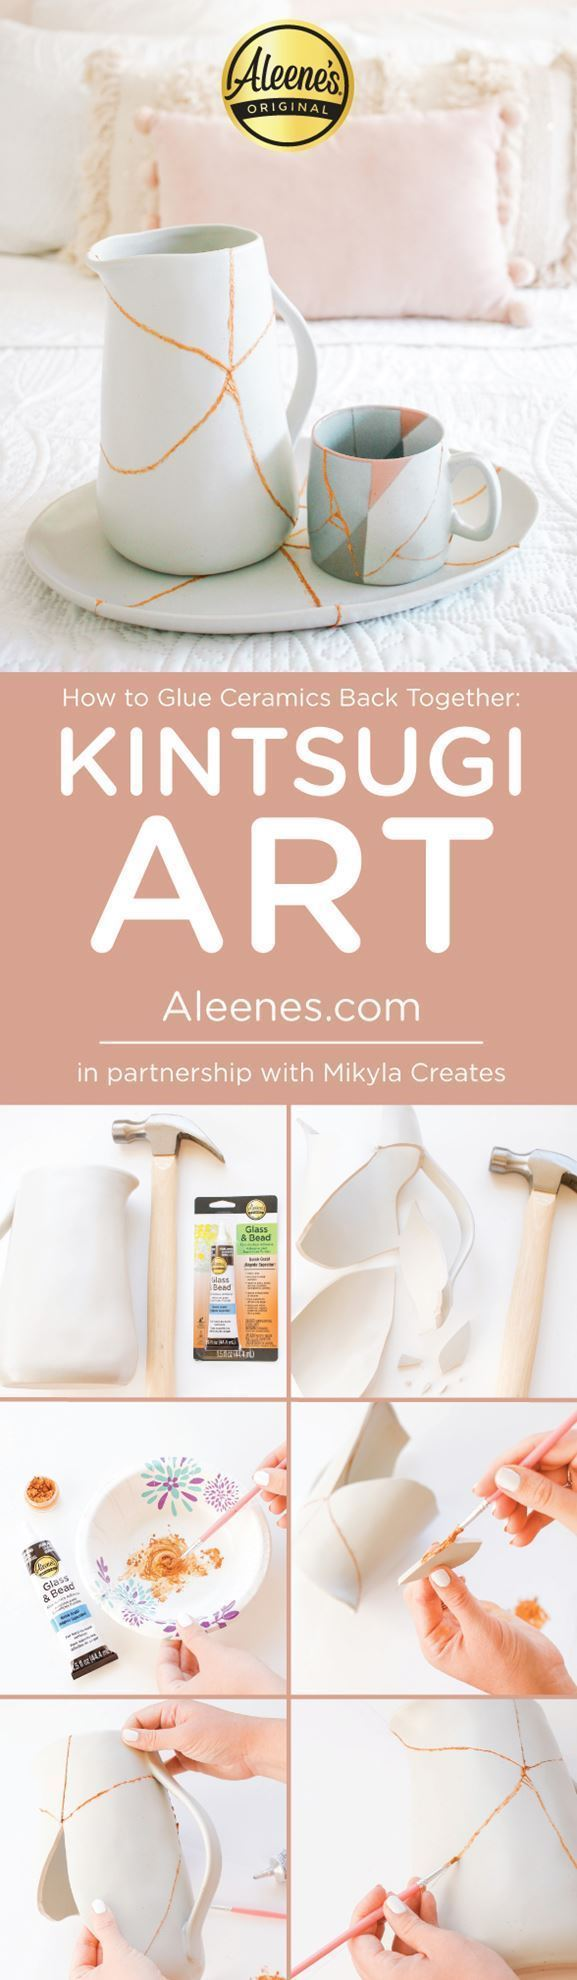 How to Glue Ceramics Back Together: Kintsugi Art